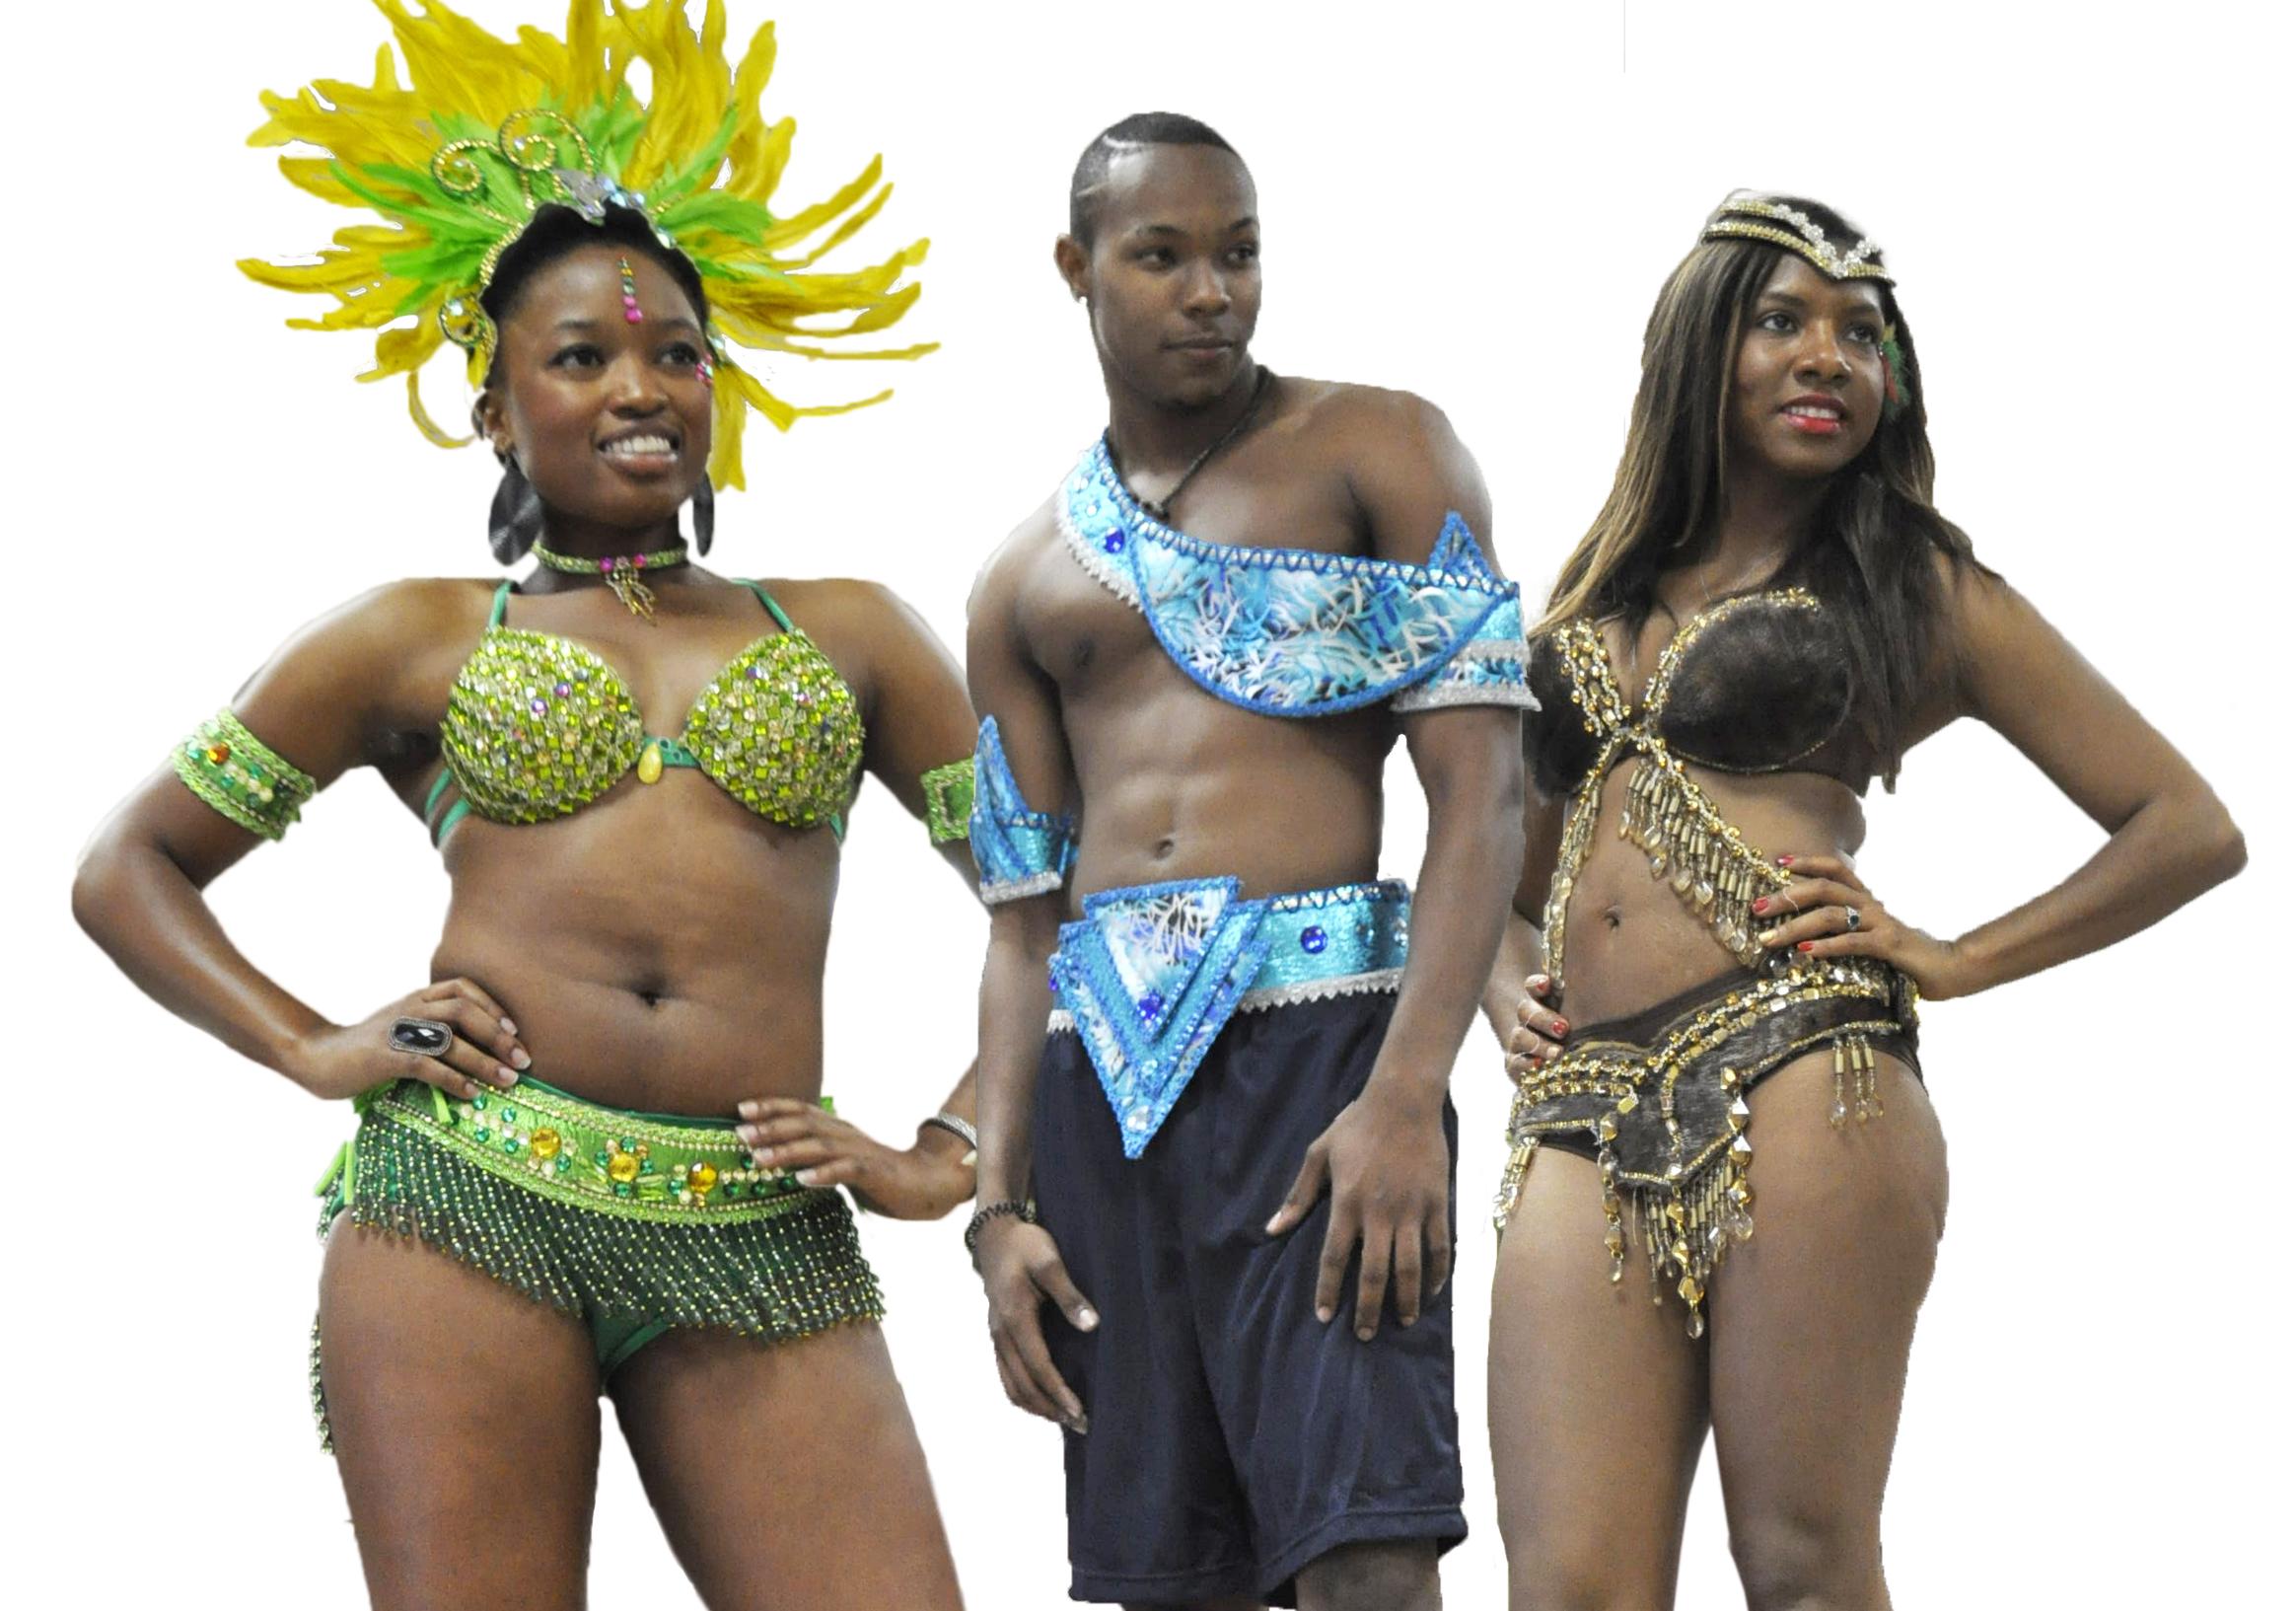 Caribfest pageant Sept. 19; parade Sept. 21